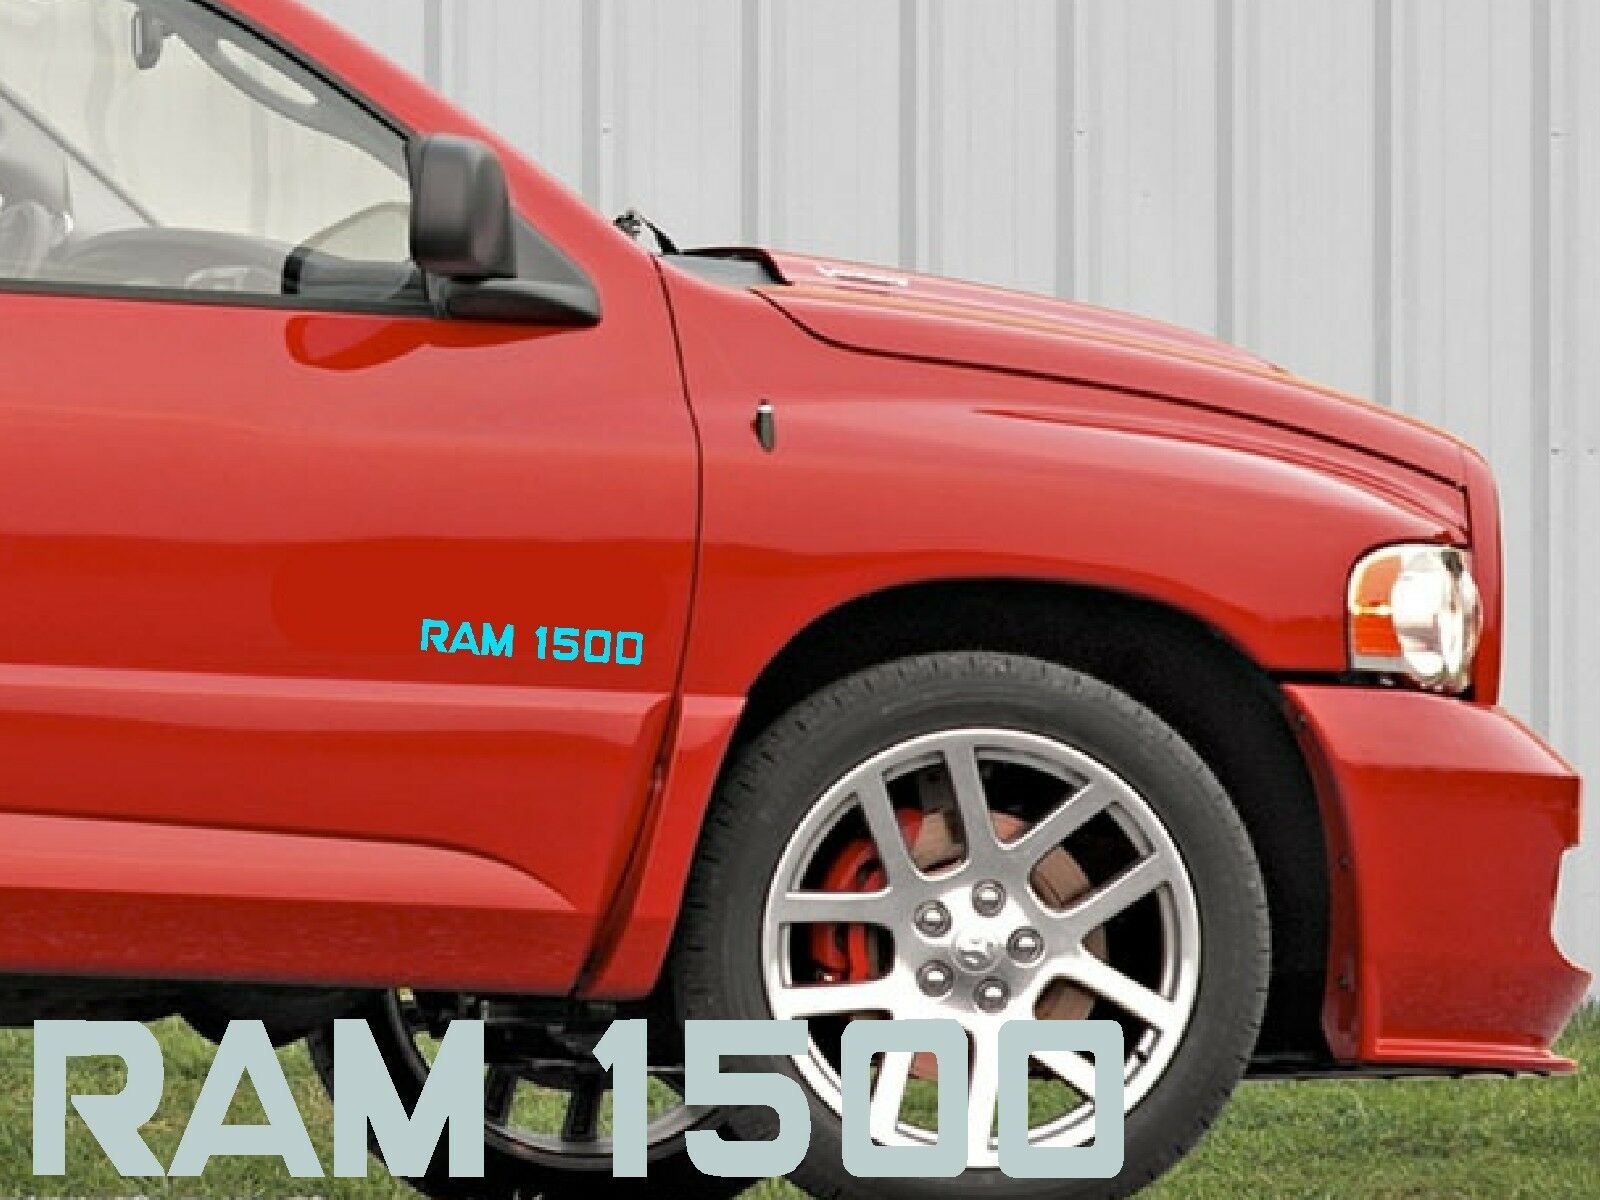 dodge ram 1500 autocollant sticker voiture vitre arri re tuning capot porte usa ebay. Black Bedroom Furniture Sets. Home Design Ideas